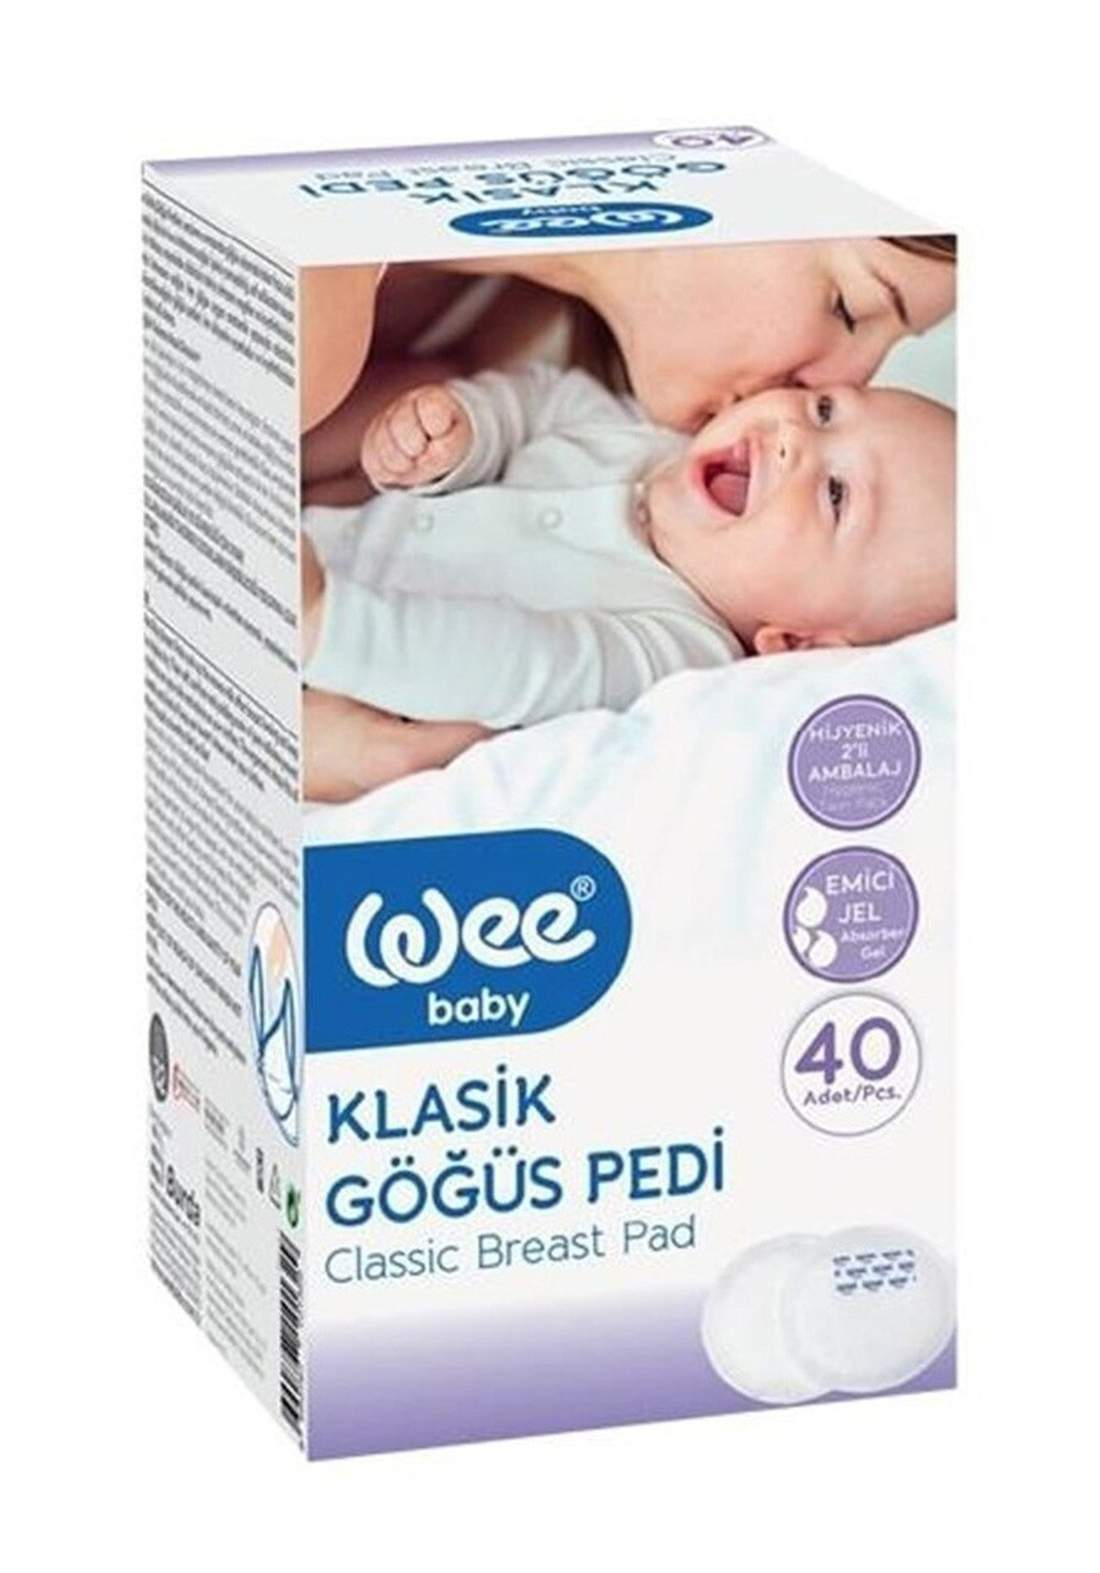 Wee Baby 132 Classic Breast Pad 40 Pieces وسائد للصدر